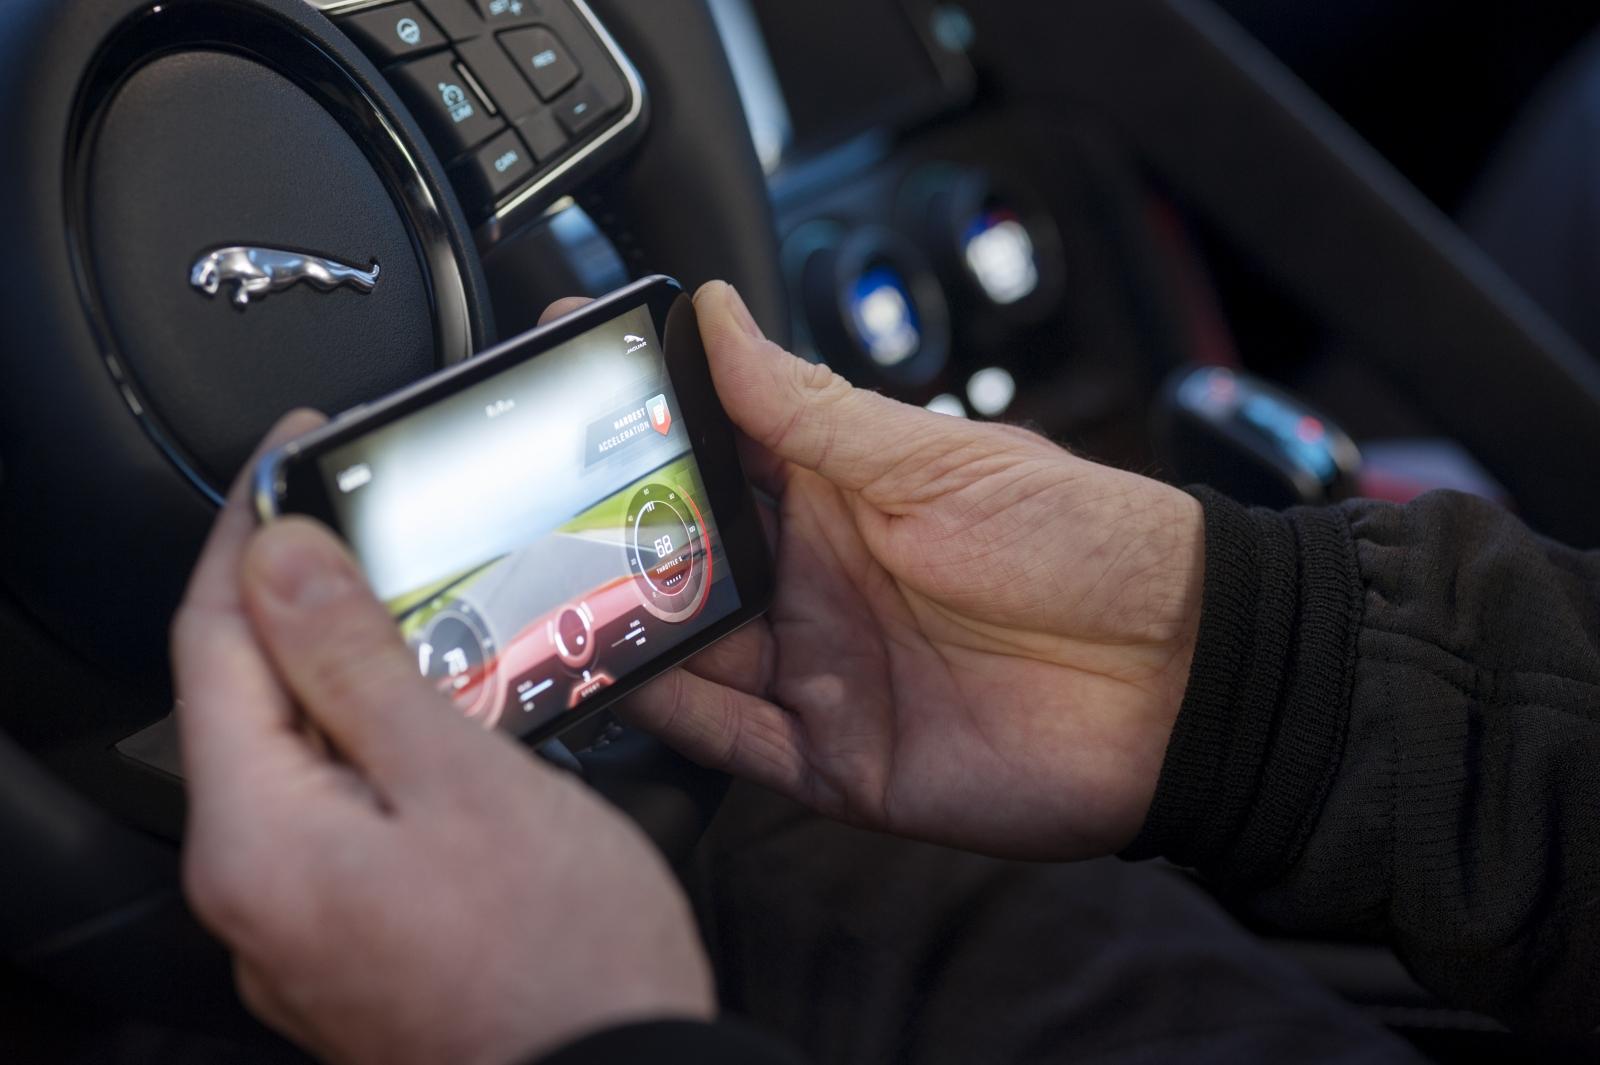 Jaguar F-Type ReRun GoPro app